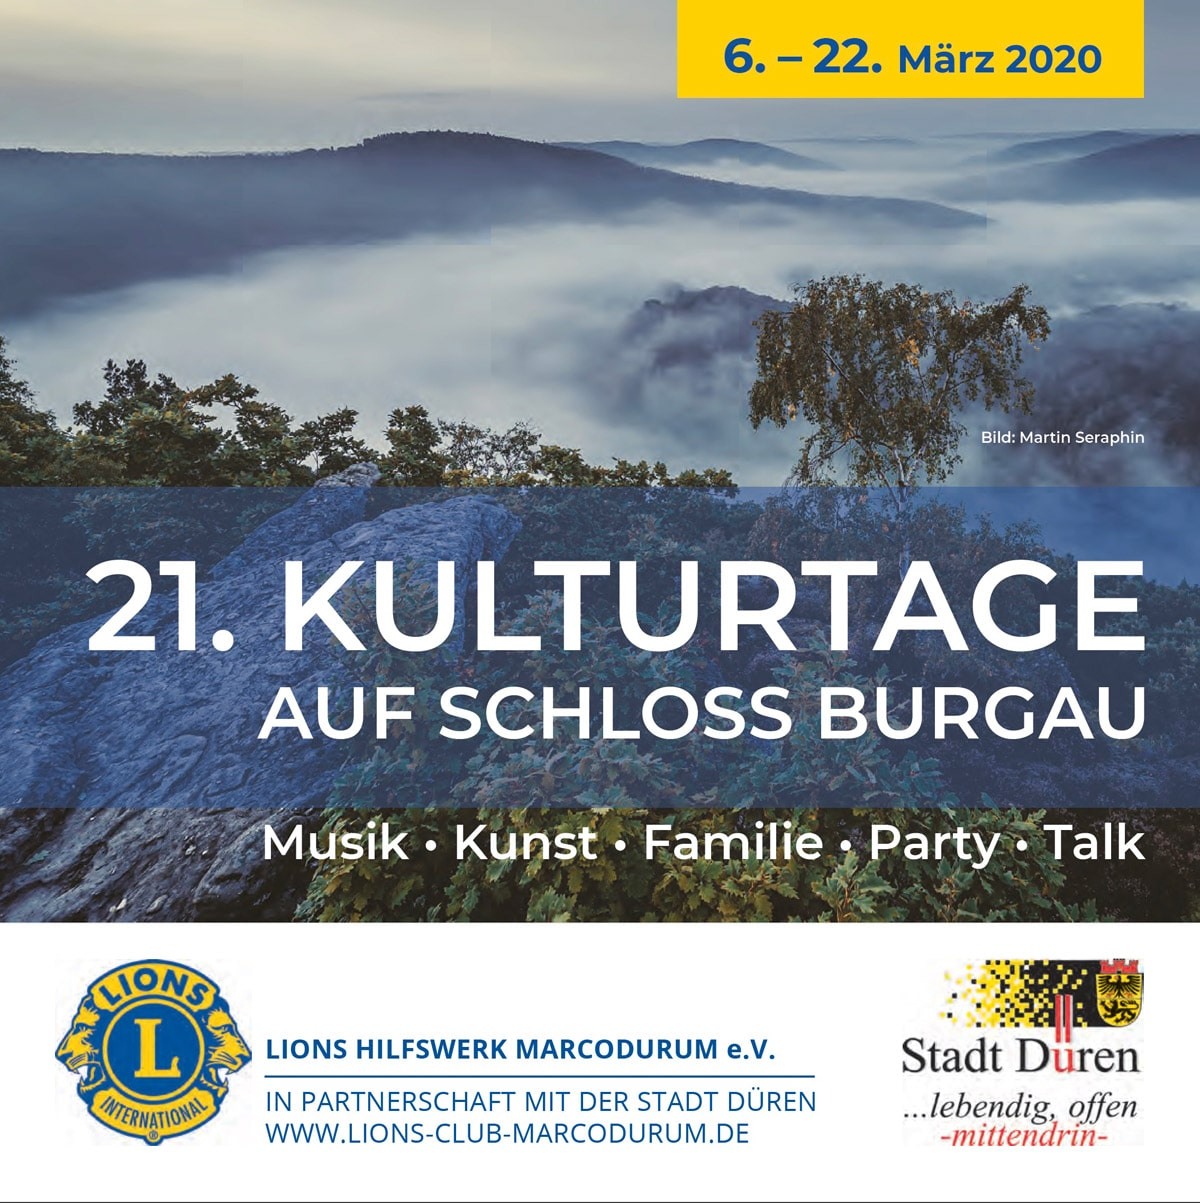 Dürener Kulturtage 2020 - Vernissage - Martin Seraphin